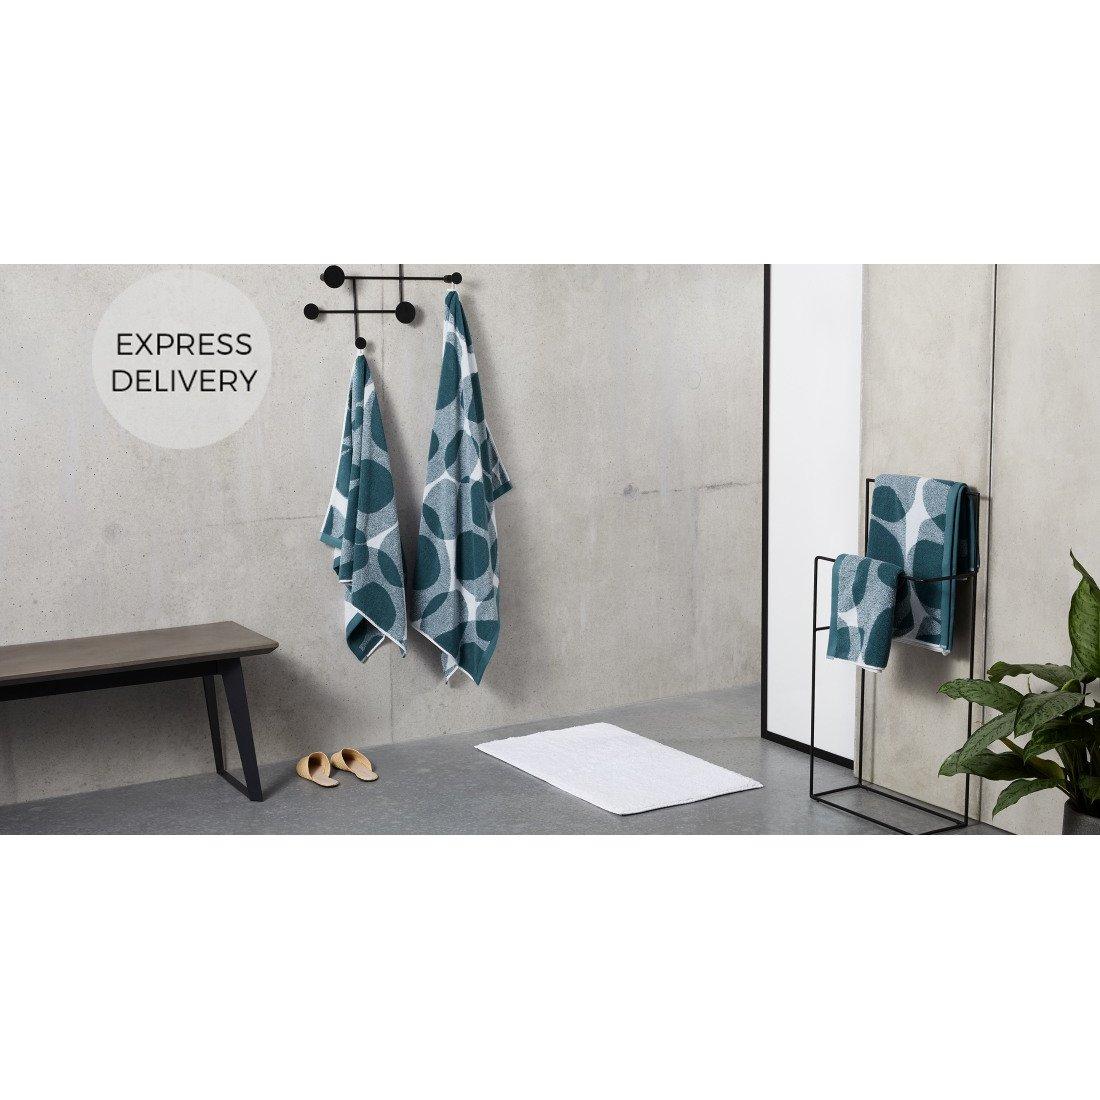 image-Holt 100% Cotton Set of 2 Hand Towels, Aegean Blue